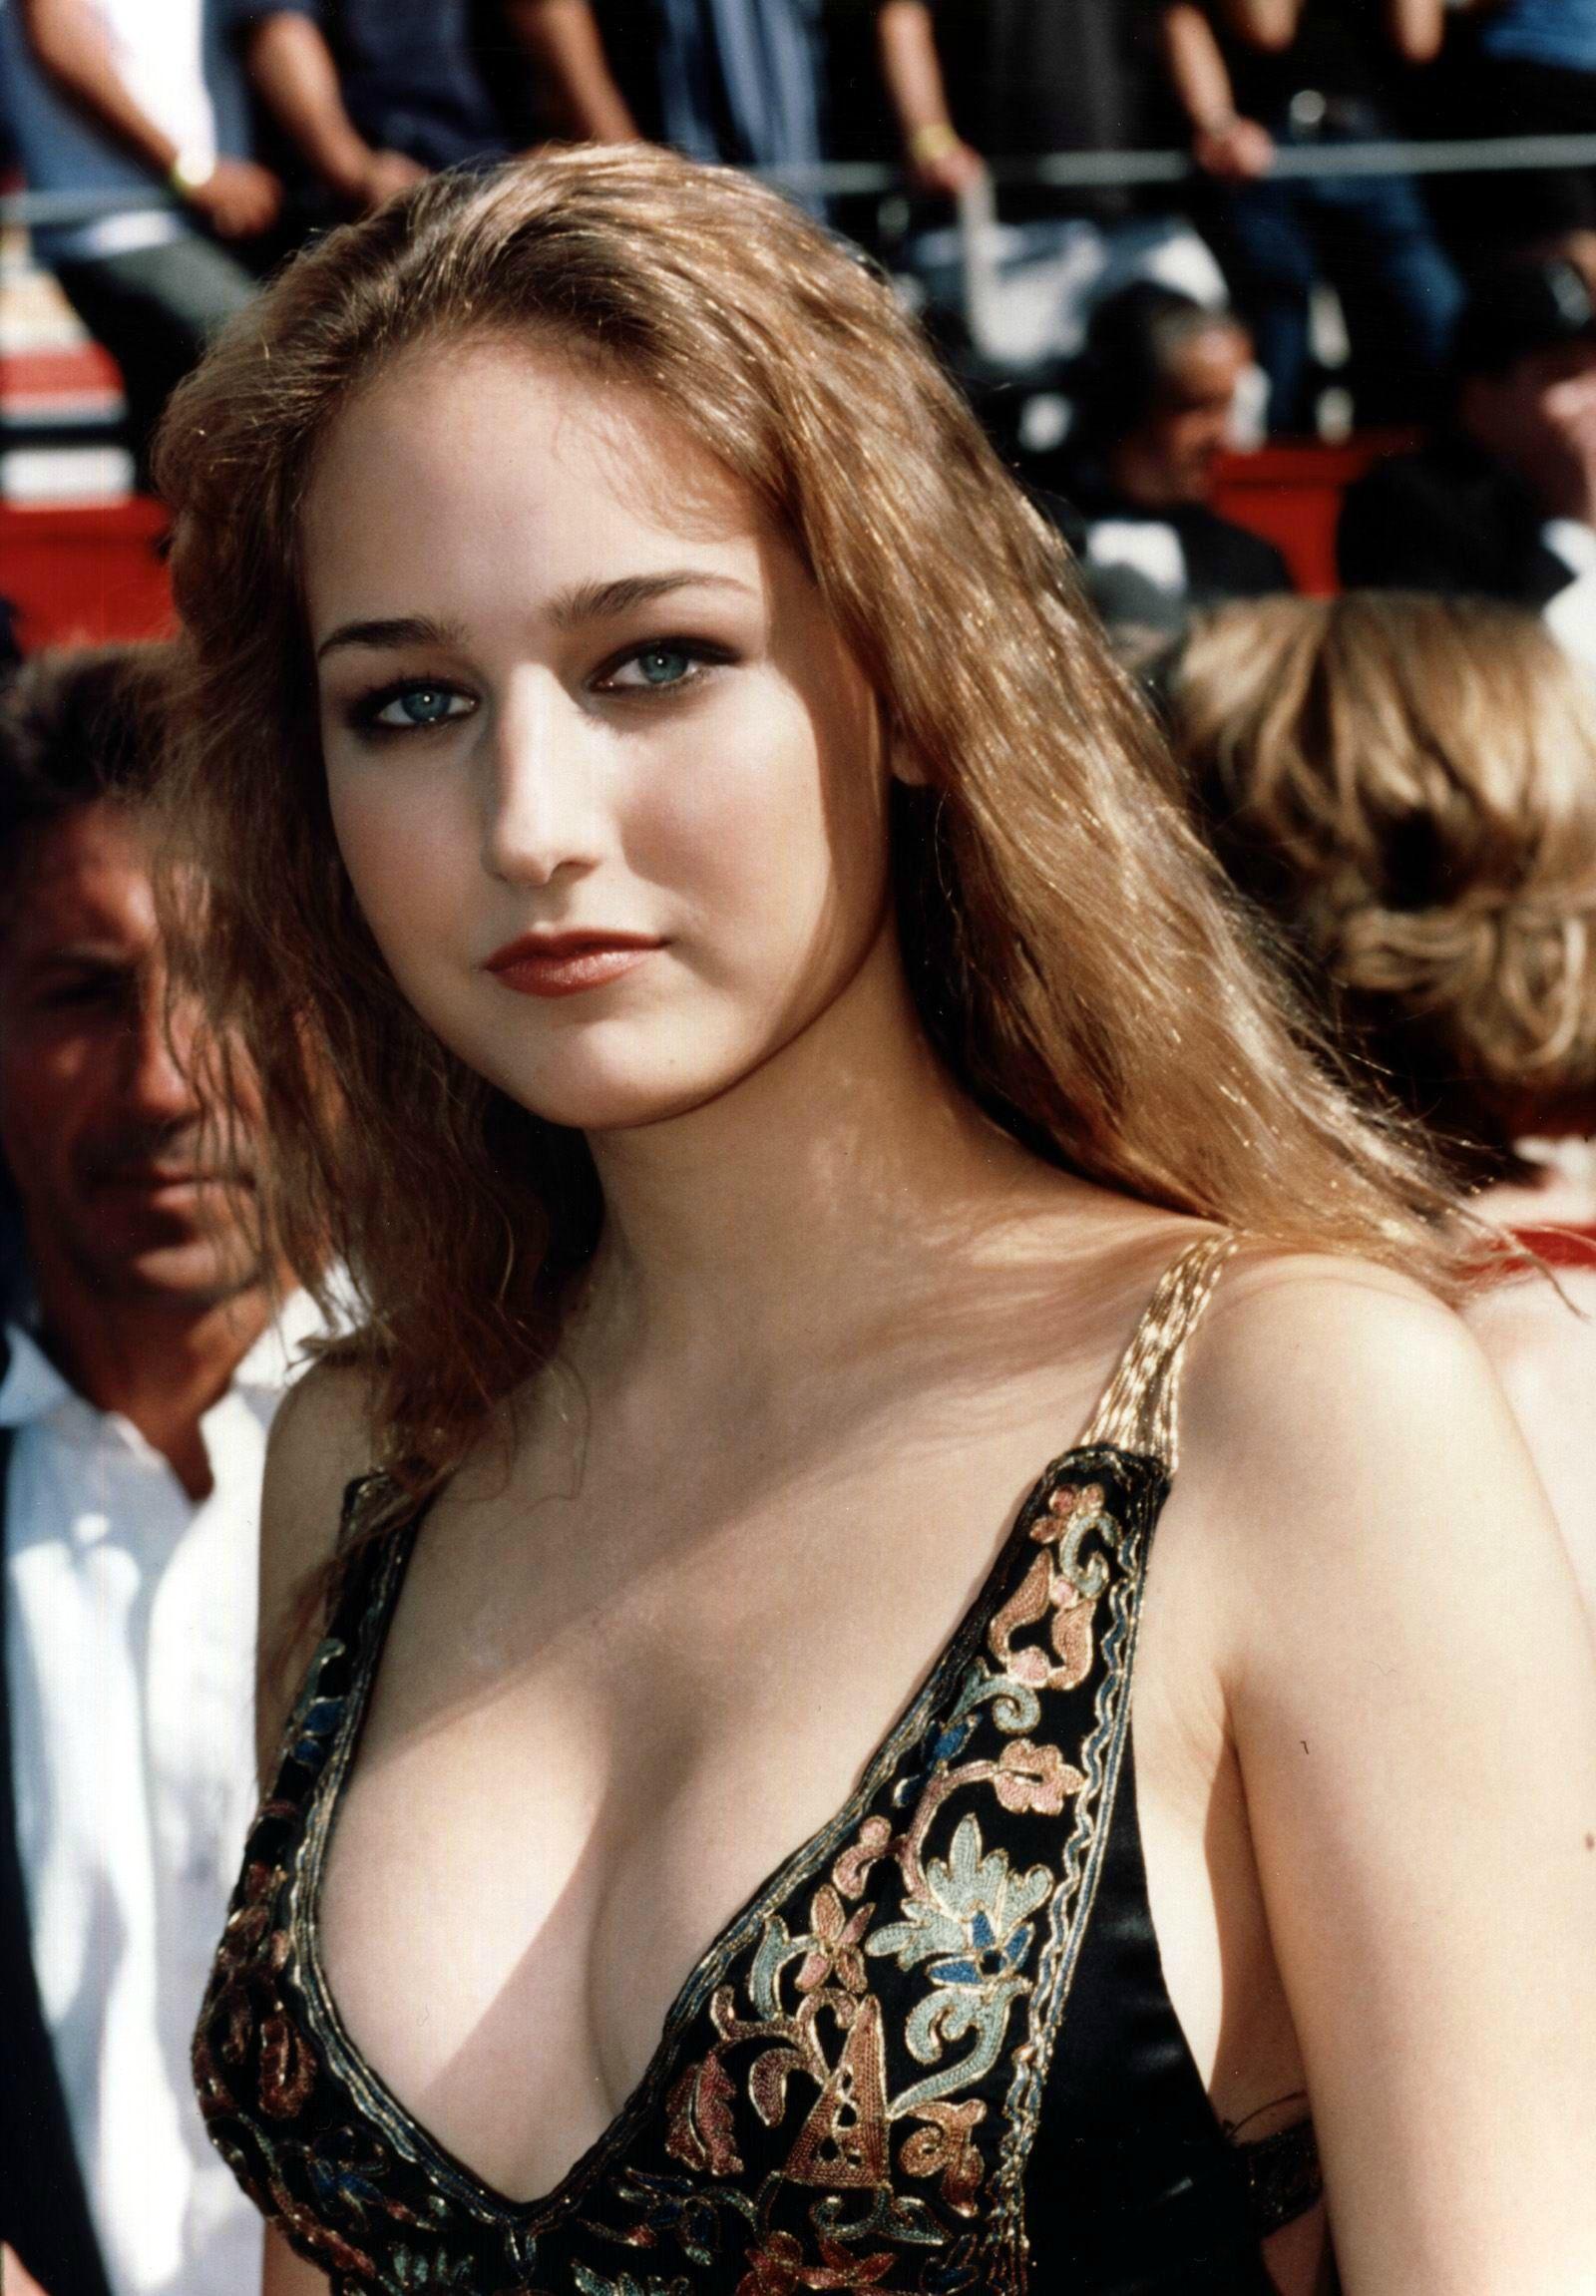 Hot Leelee Sobieski